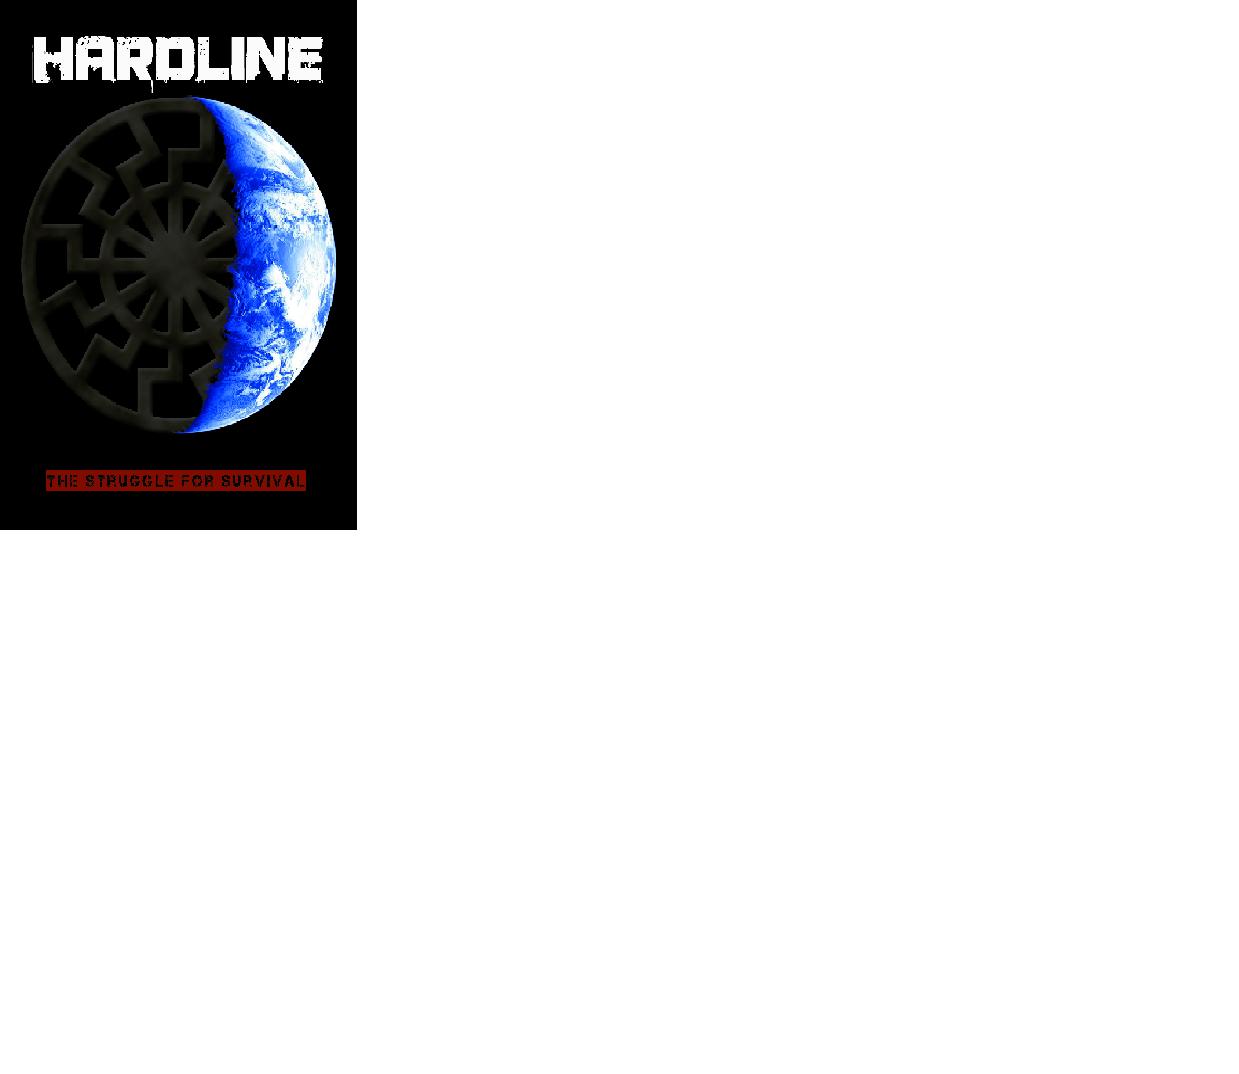 Hardline- 14 Words